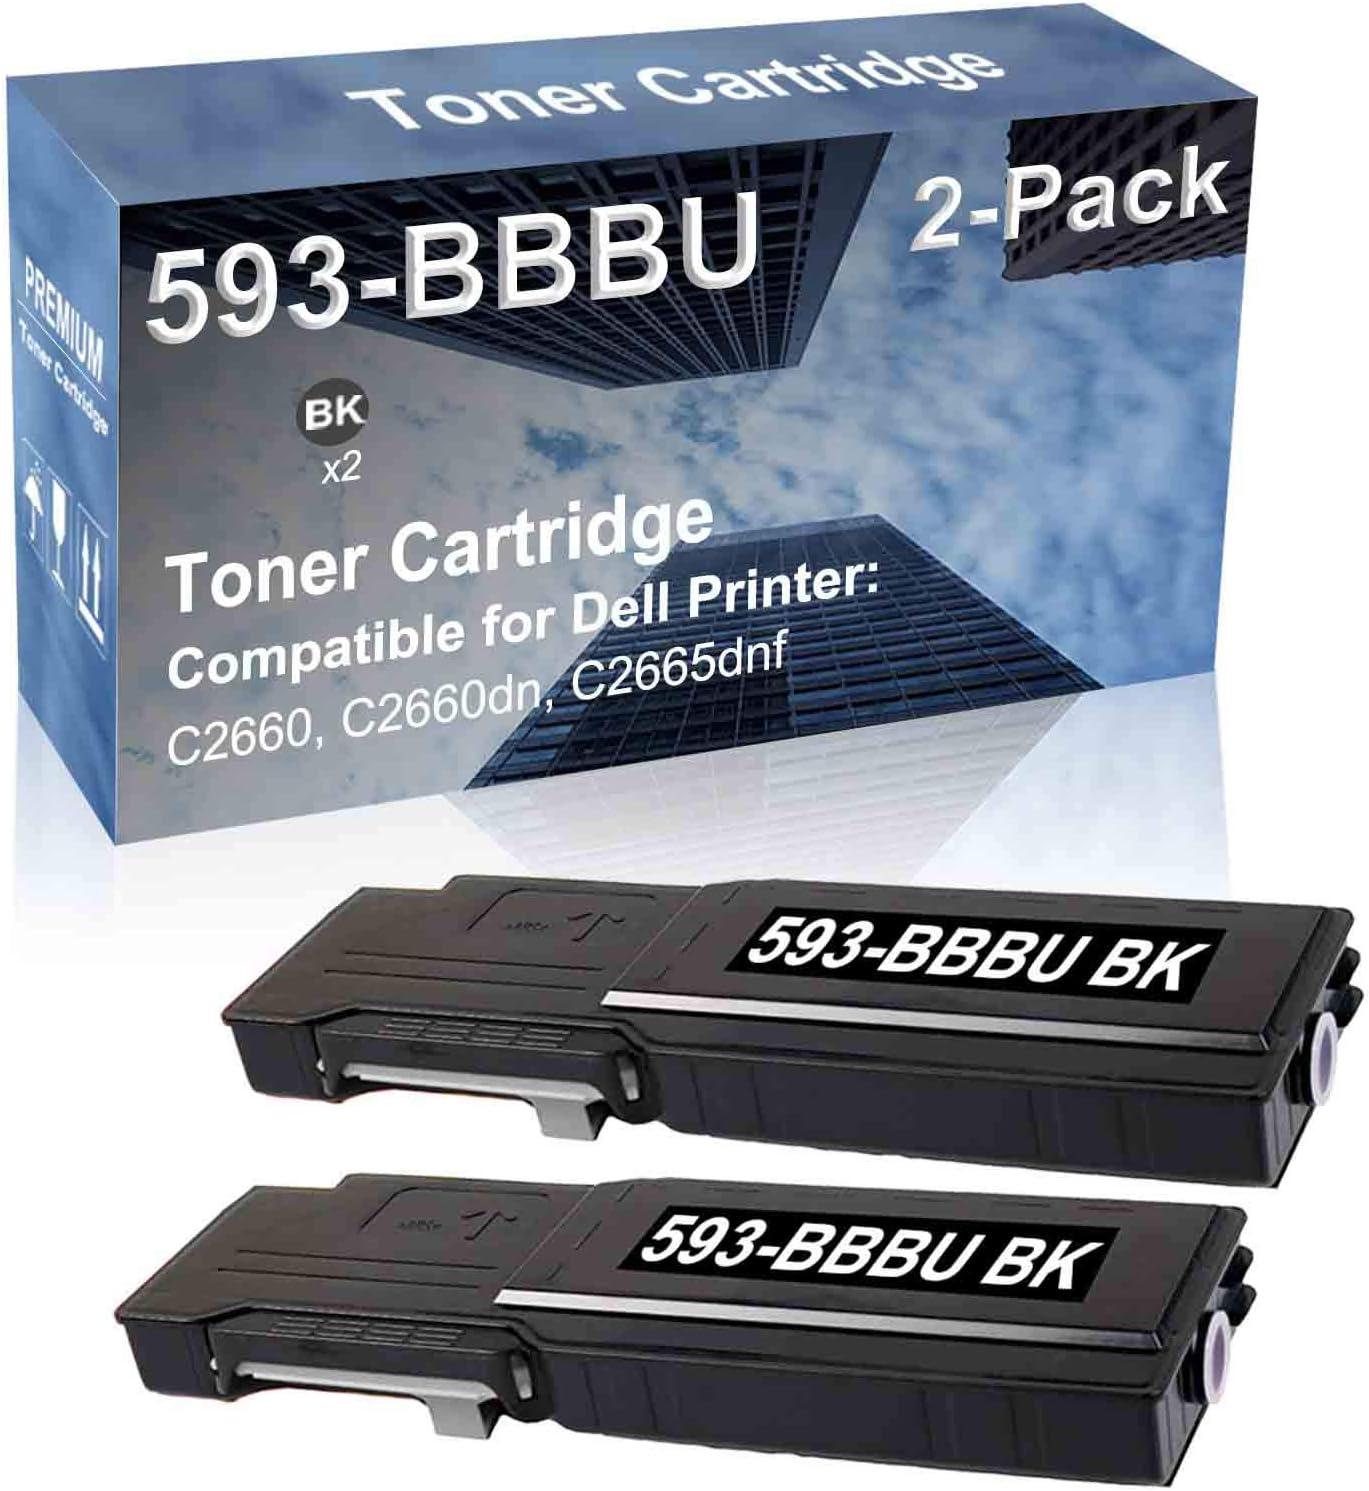 2-Pack (Black) Compatible C2660, C2660dn, C2665dnf Printer Toner Cartridge High Capacity Replacement for Dell 593-BBBU Toner Cartridge